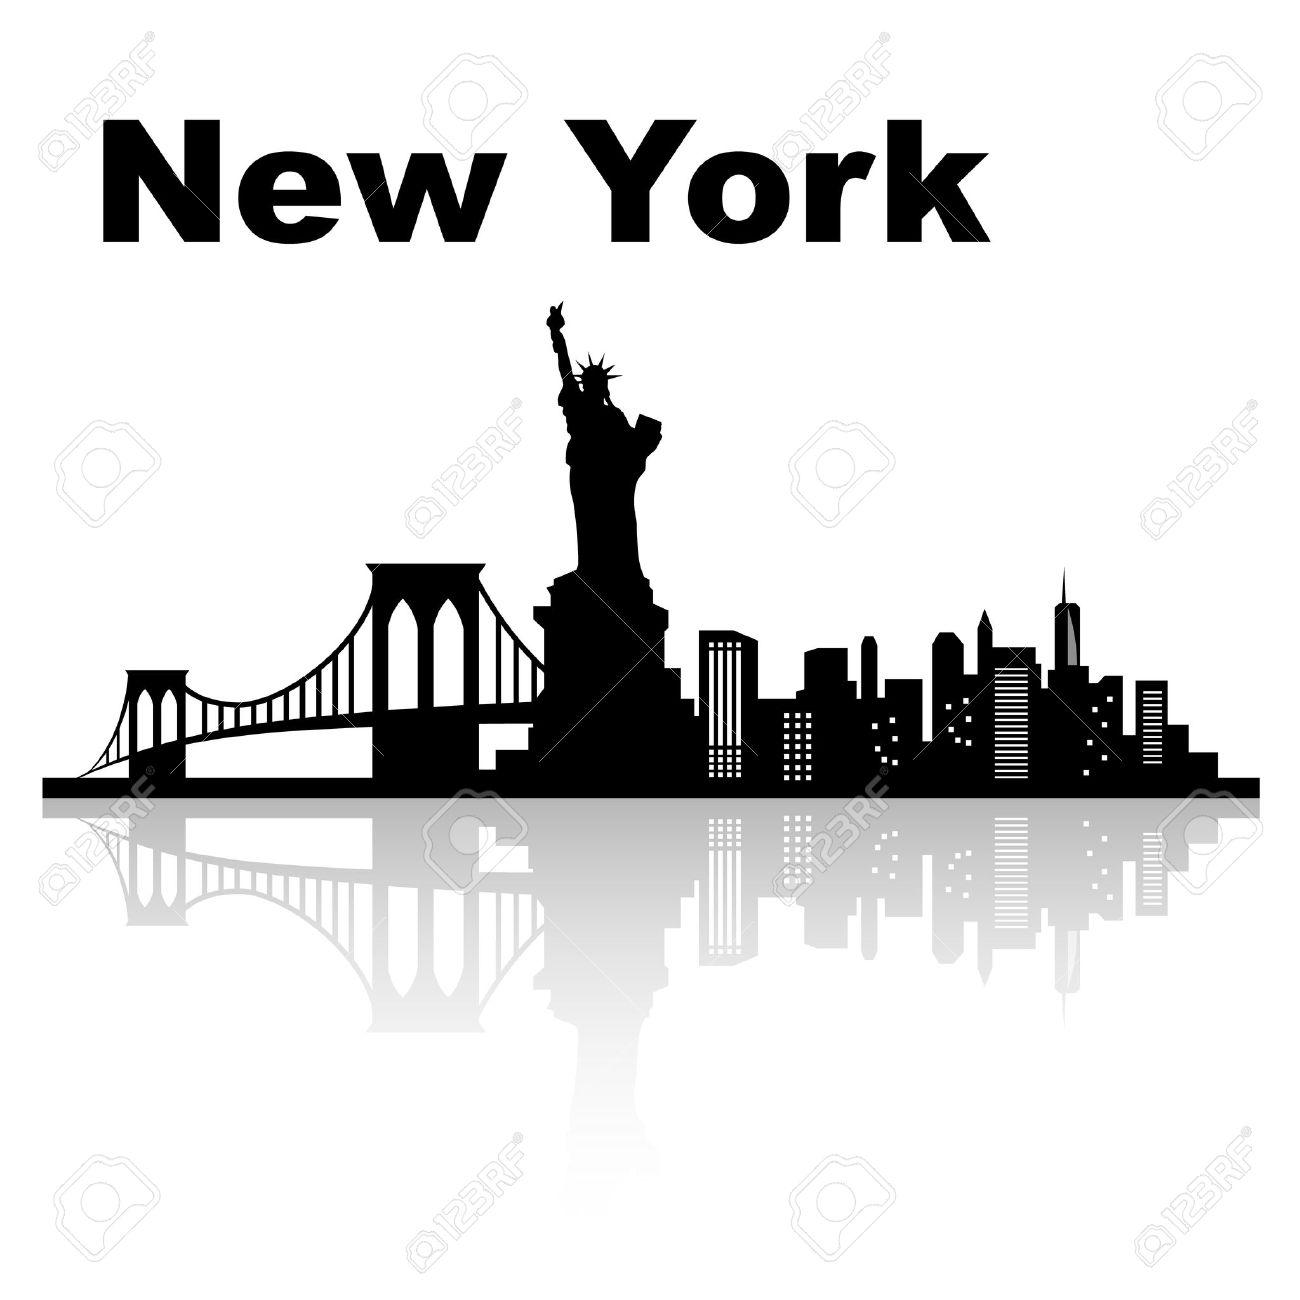 Silhouette of New York.